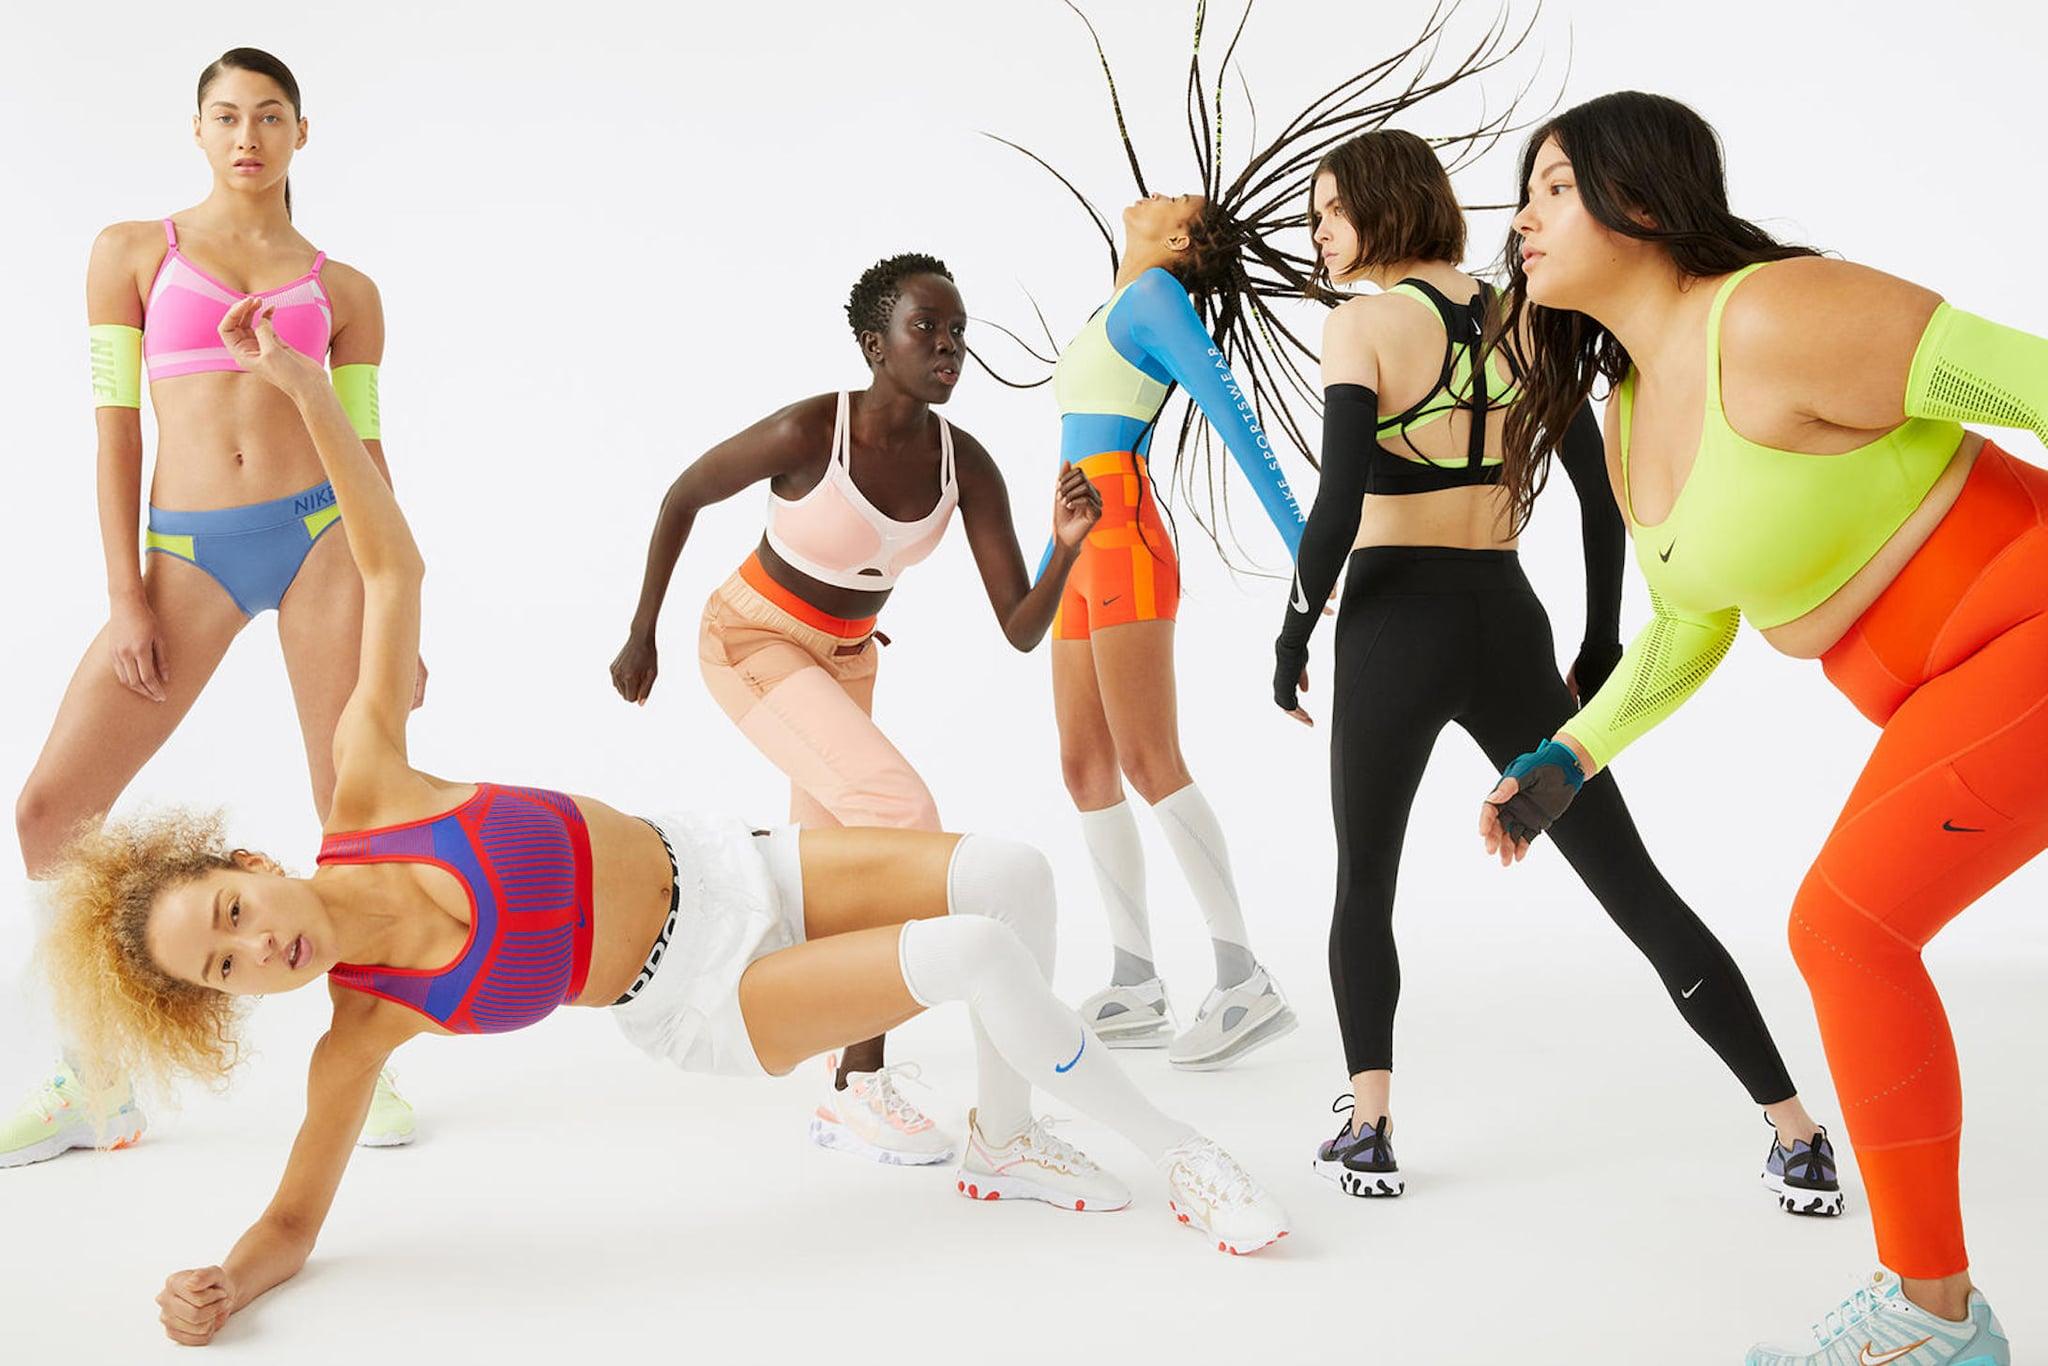 c1e00a2cdf9 Nike Expands Sports Bra Sizes 2019